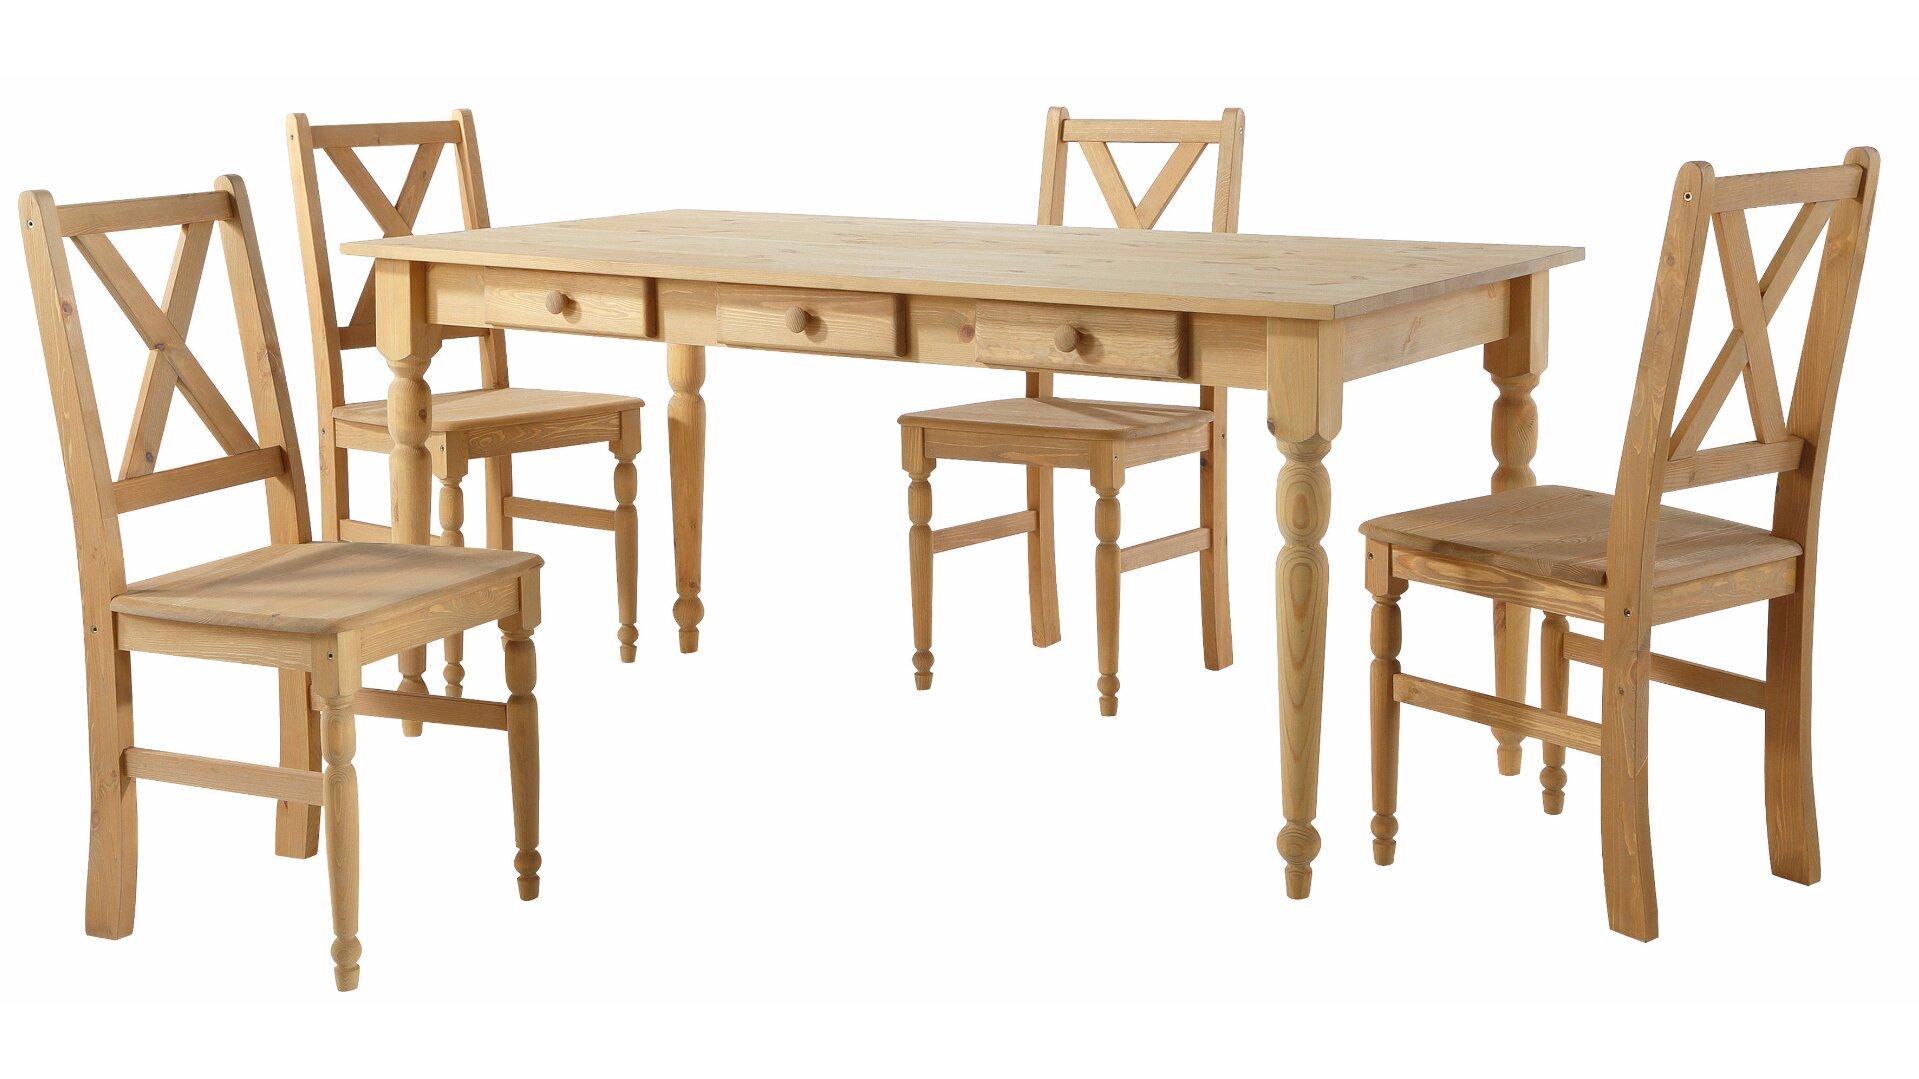 Hokku Designs Noah Dining Set With 4 Chairs U0026 Reviews | Wayfair.co.uk